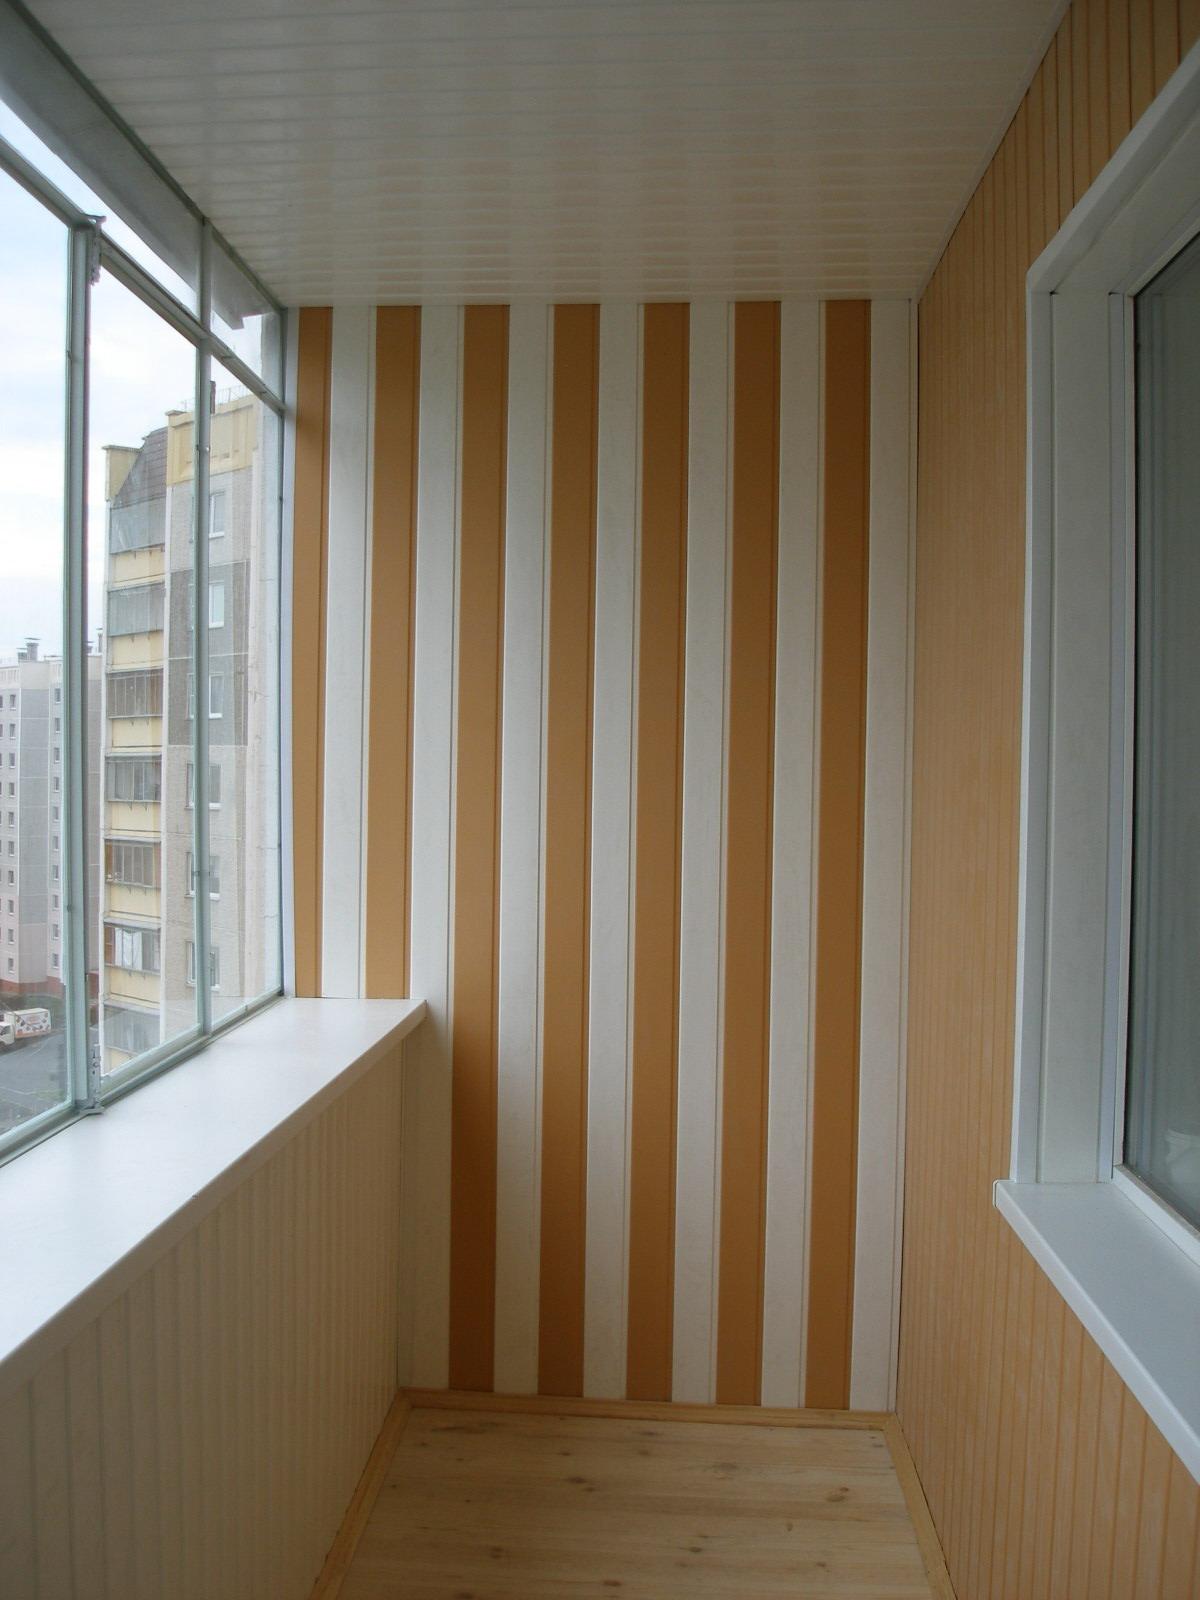 Утепление балкона и обшивка мдф цена.